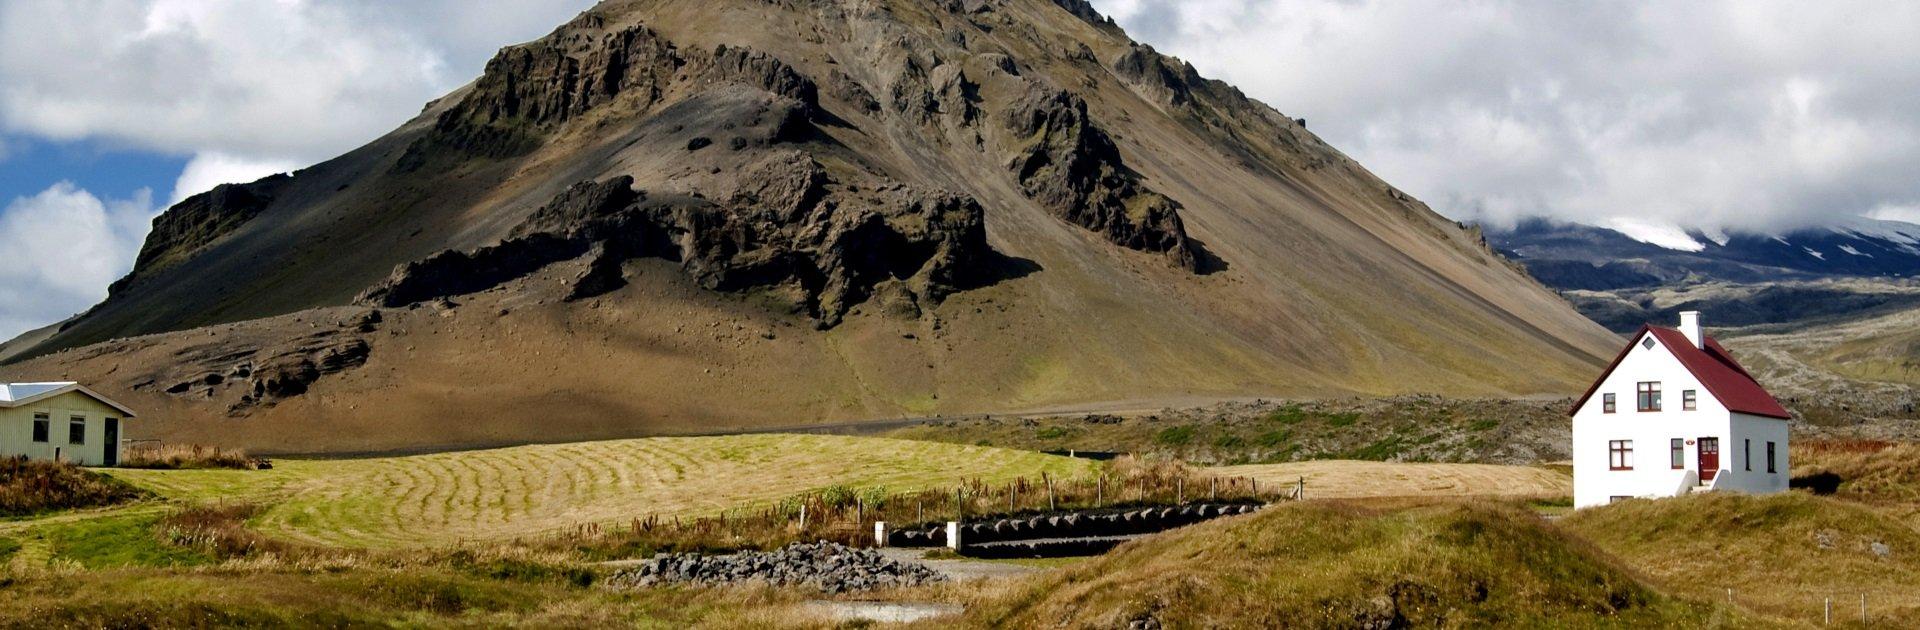 Ferienunterkünfte in Island